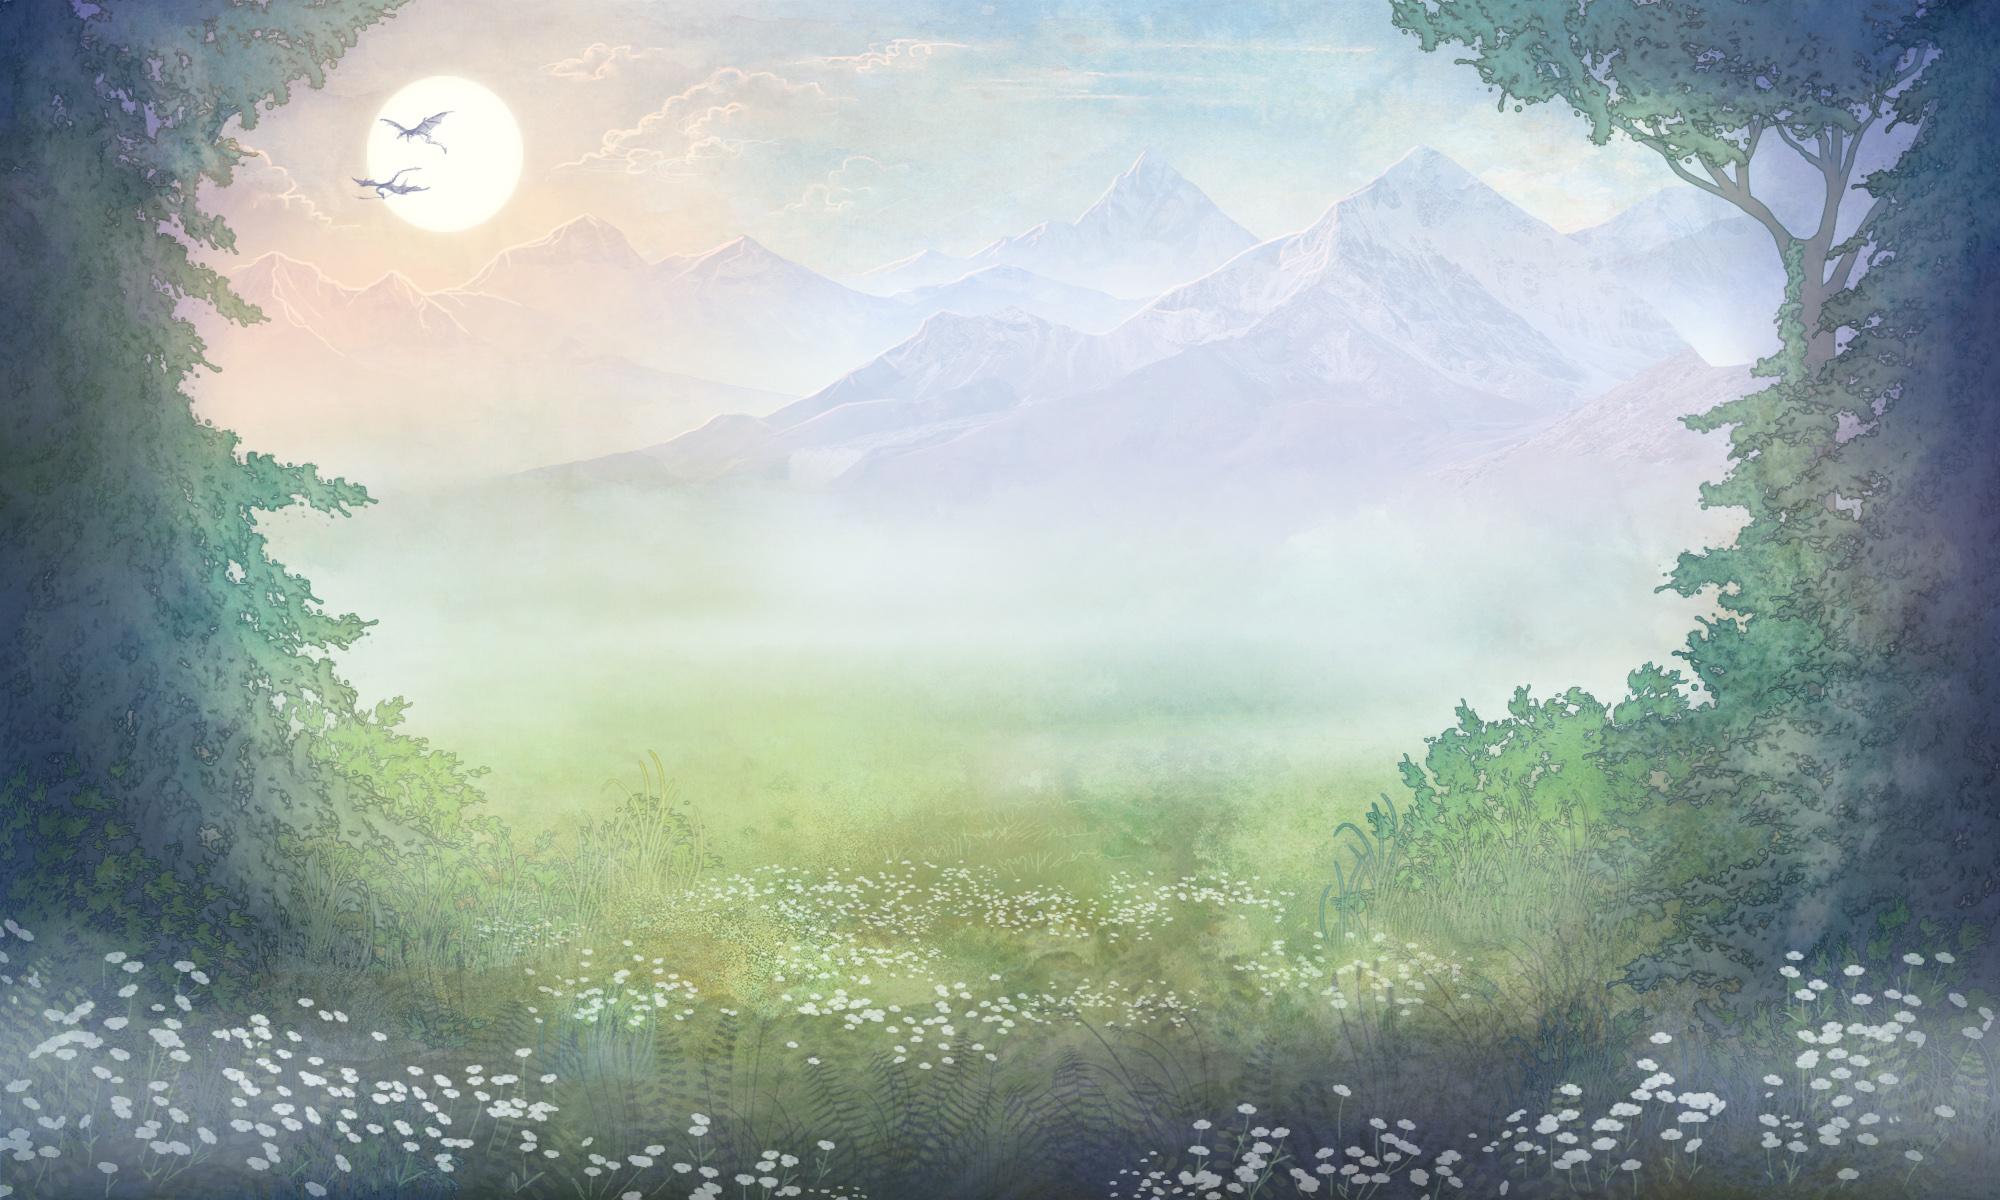 The World of Pangaea